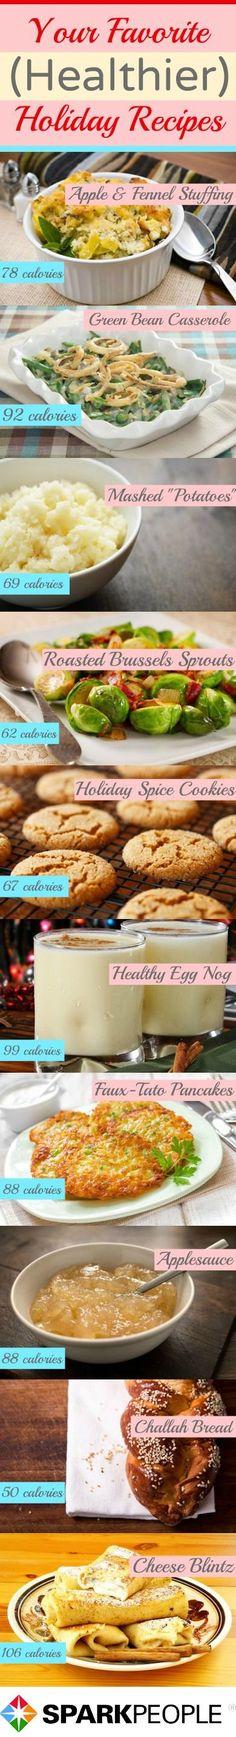 Health(ier) Holiday Favorites | via @SparkPeople #recipe #food